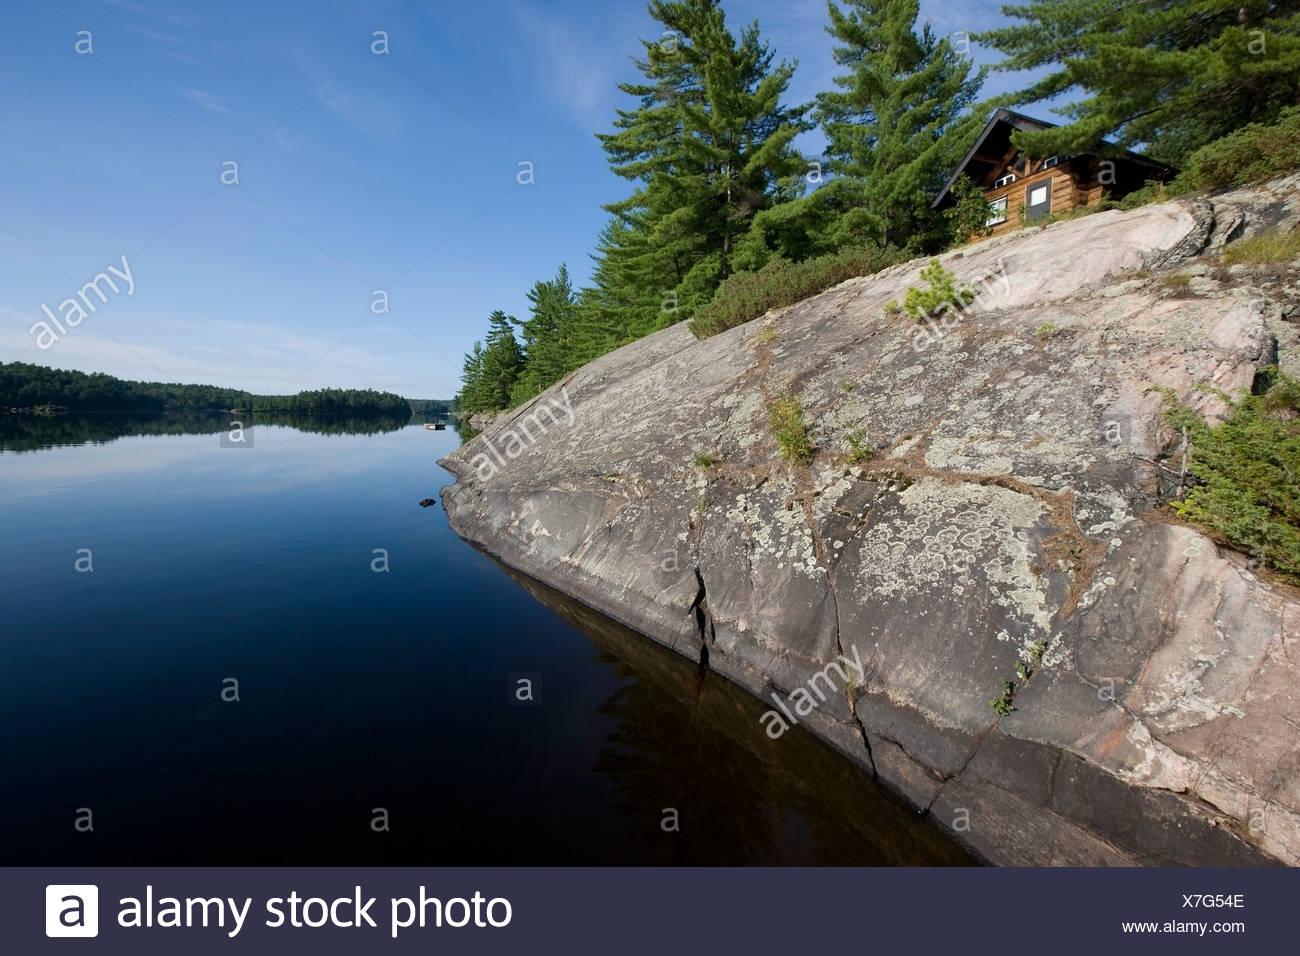 Cabin nestled amongst white pines on Rock Lake near Killarney, Ontario, Canada - Stock Image